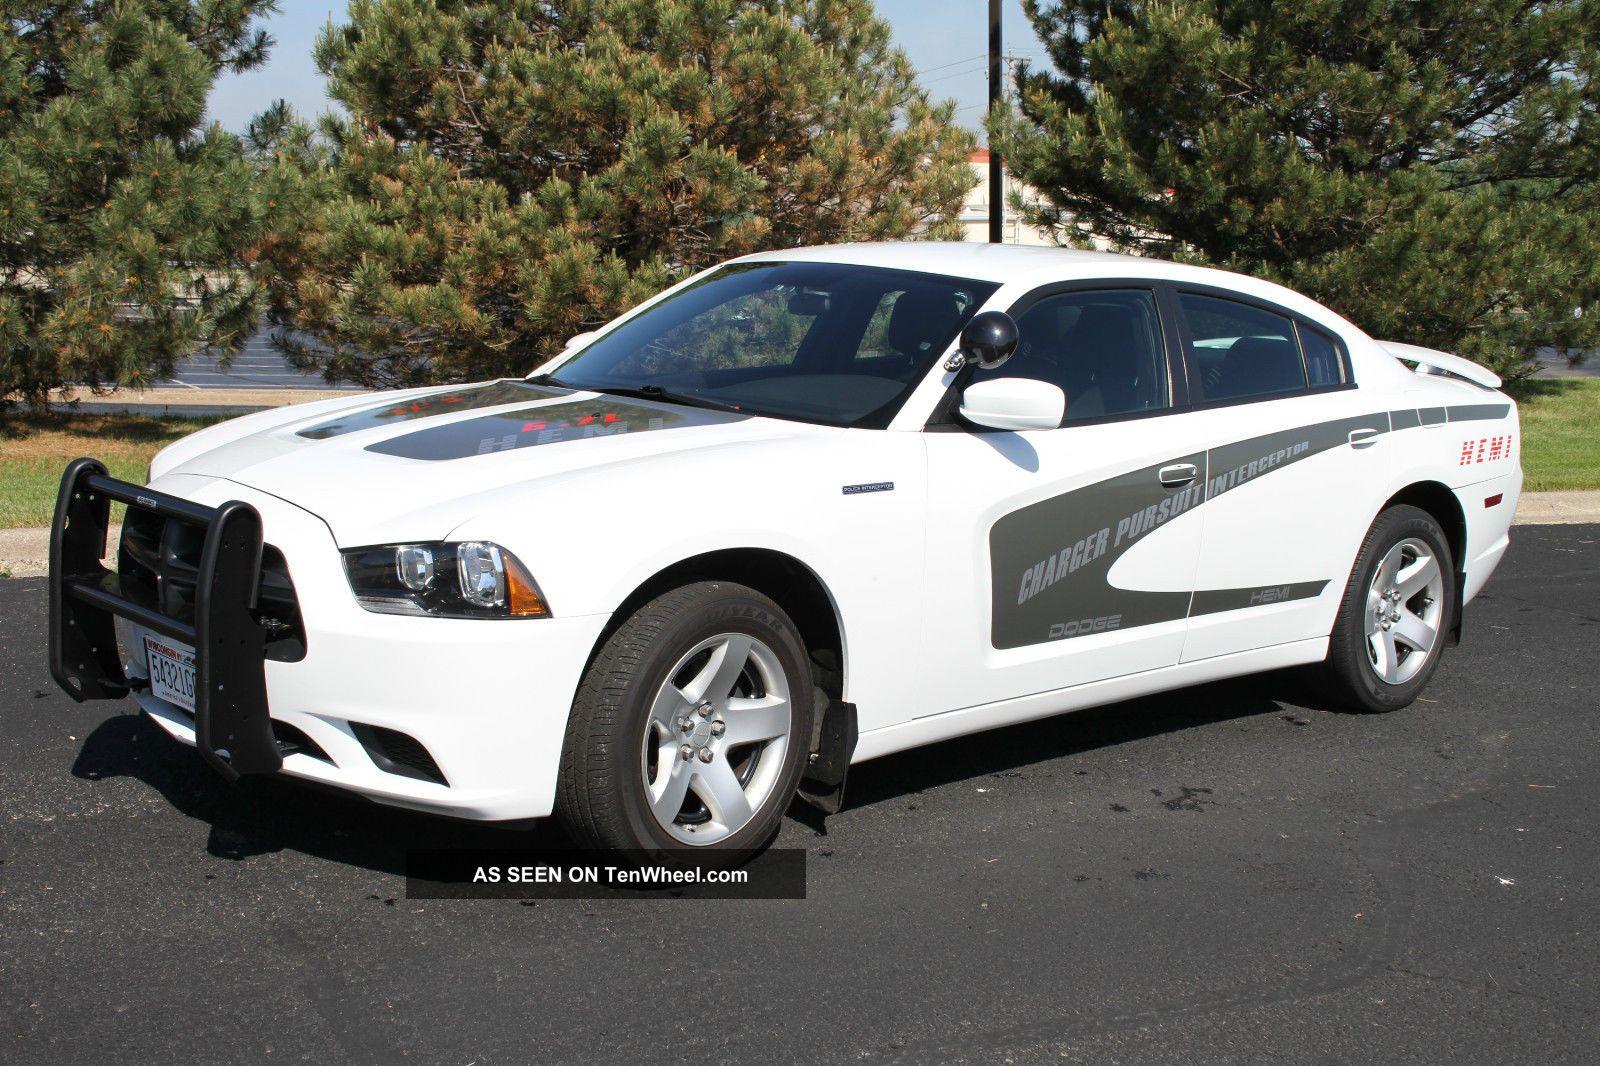 2011 Dodge Charger Police Pursuit Interceptor Hemi 5 7 Liter